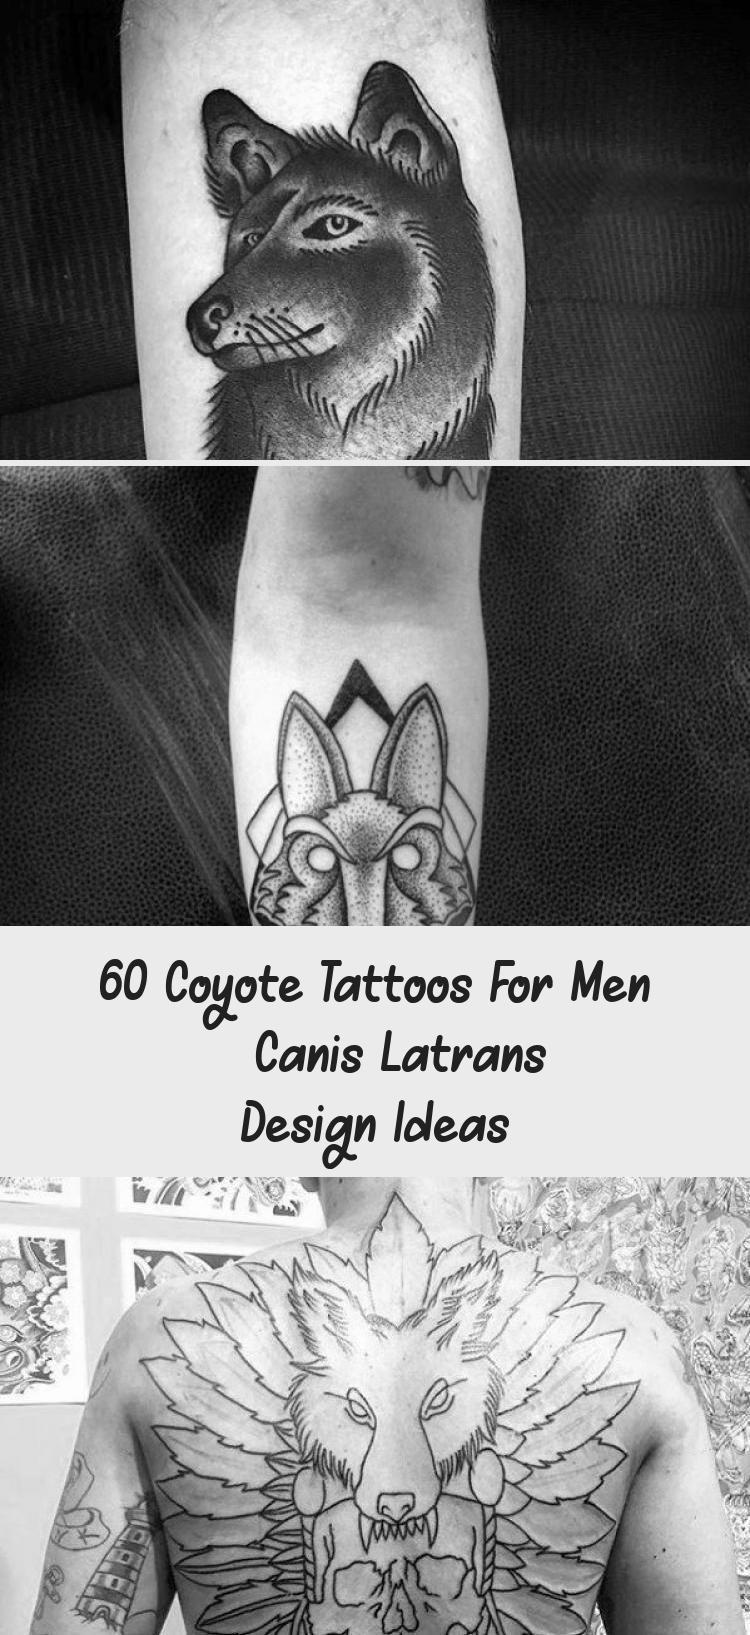 60 Coyote Tattoos For Men  Canis Latrans Design Ideas  Tattoos  60 Coyote Tattoos For Men  Canis Latrans Design Ideas